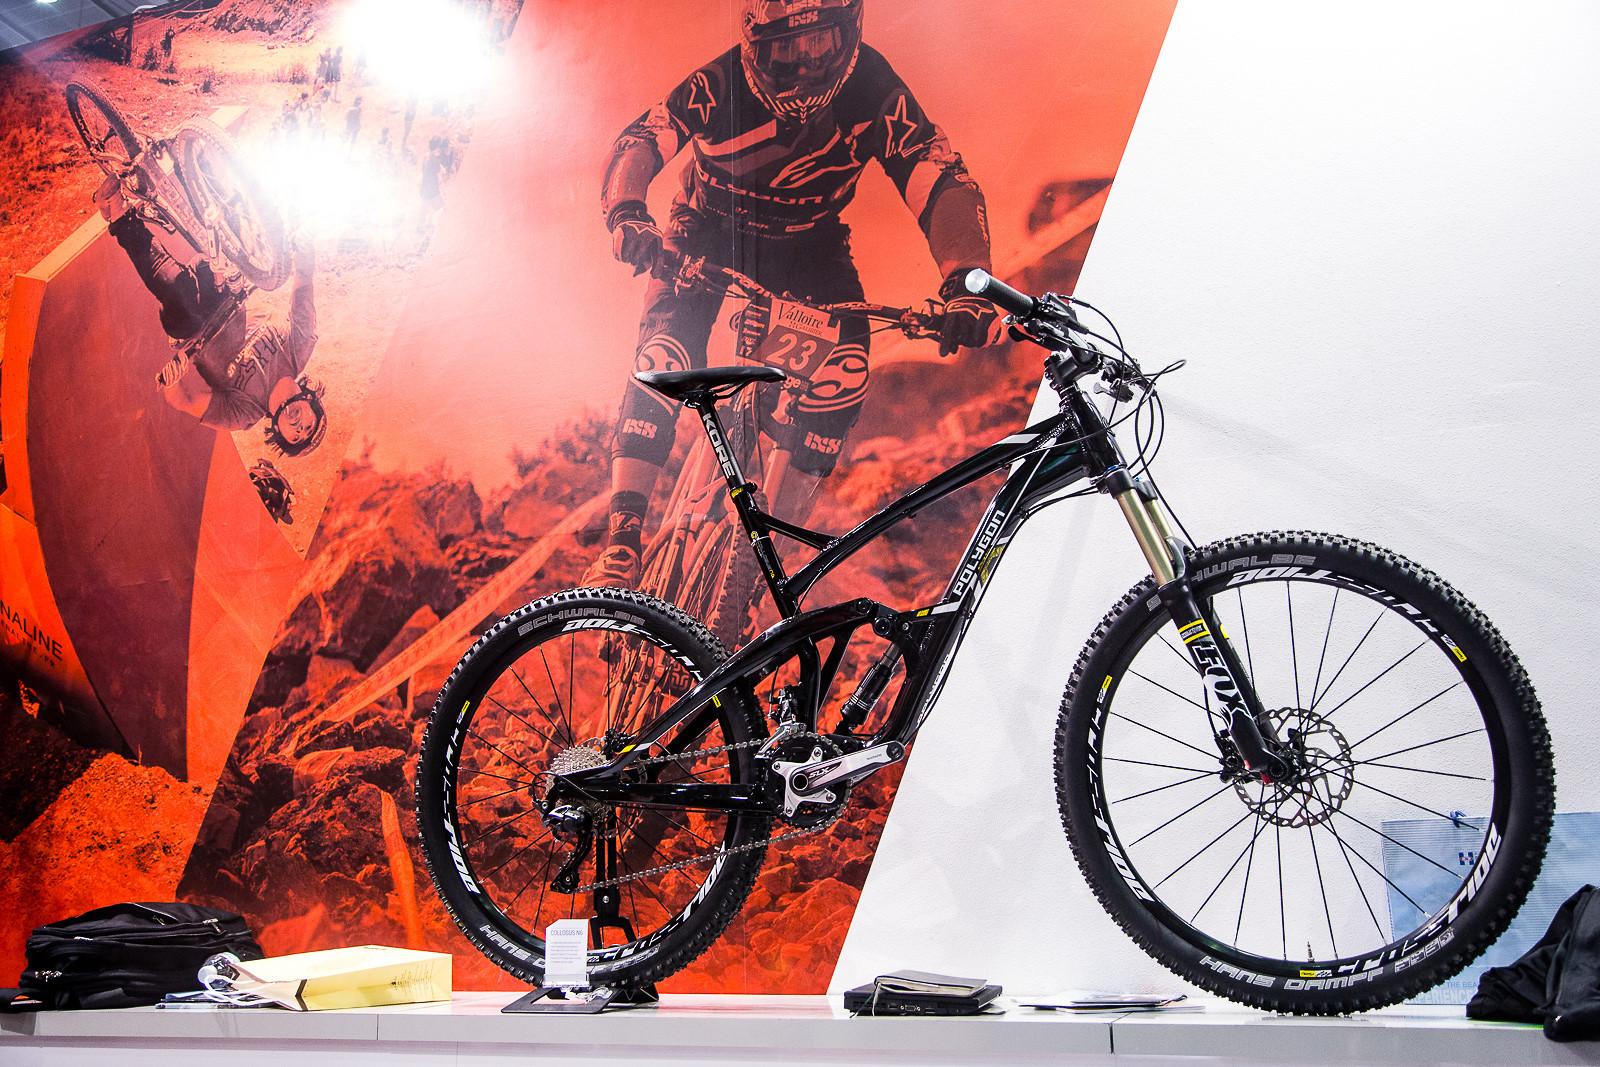 Alloy Polygon Collosus N8 - LTrumpore - Mountain Biking Pictures - Vital MTB